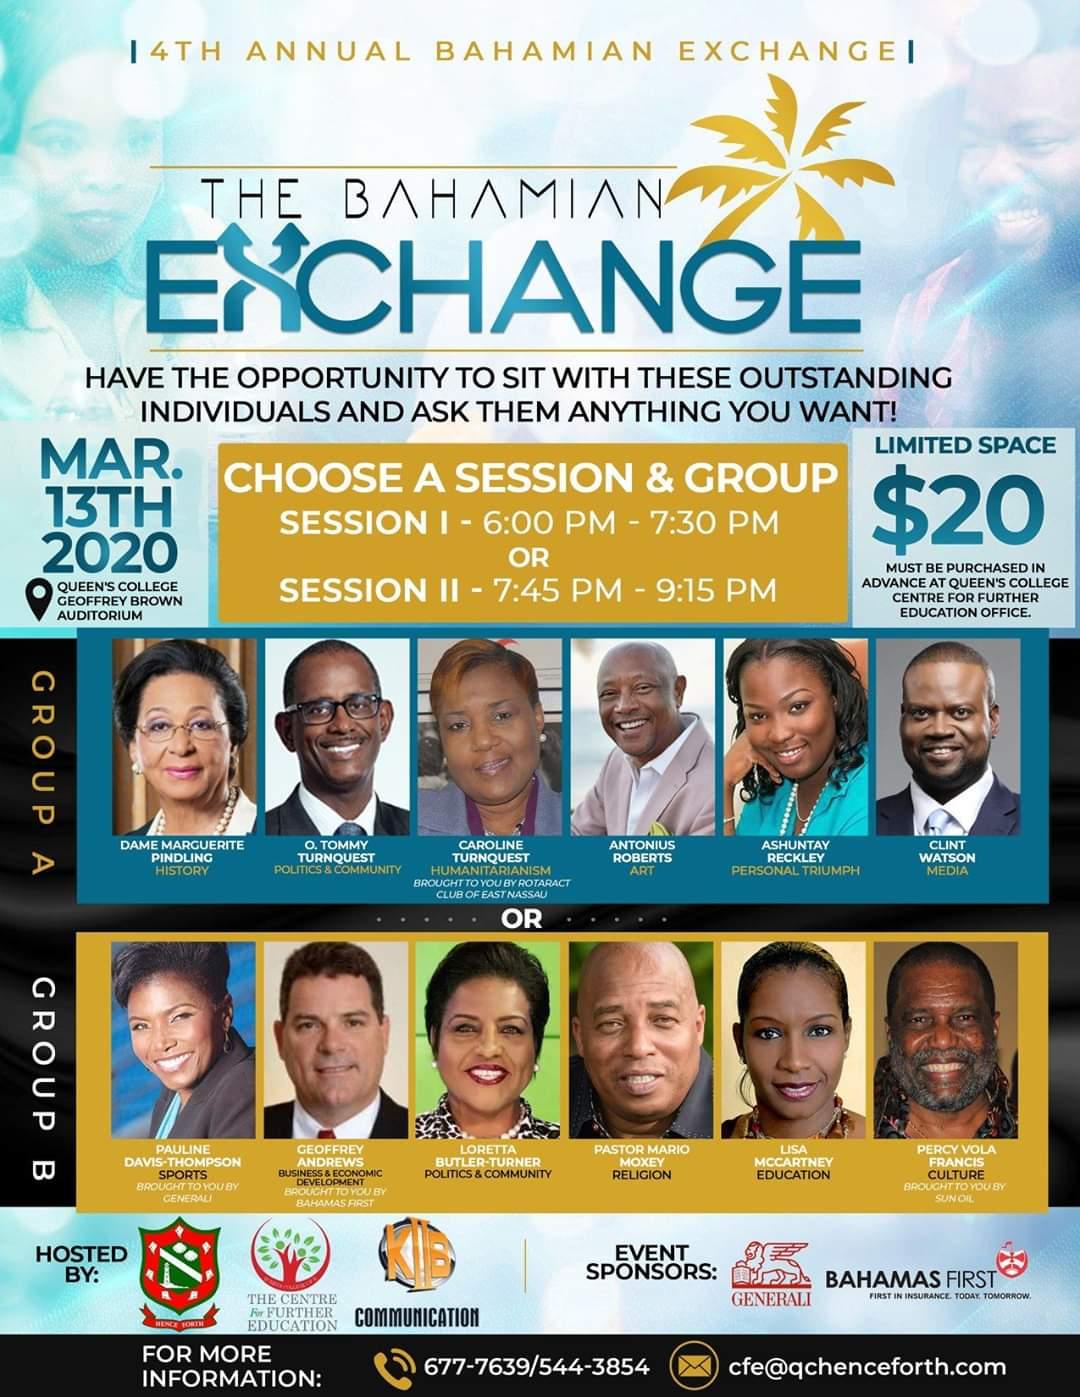 4th Annual Bahamian Exchange